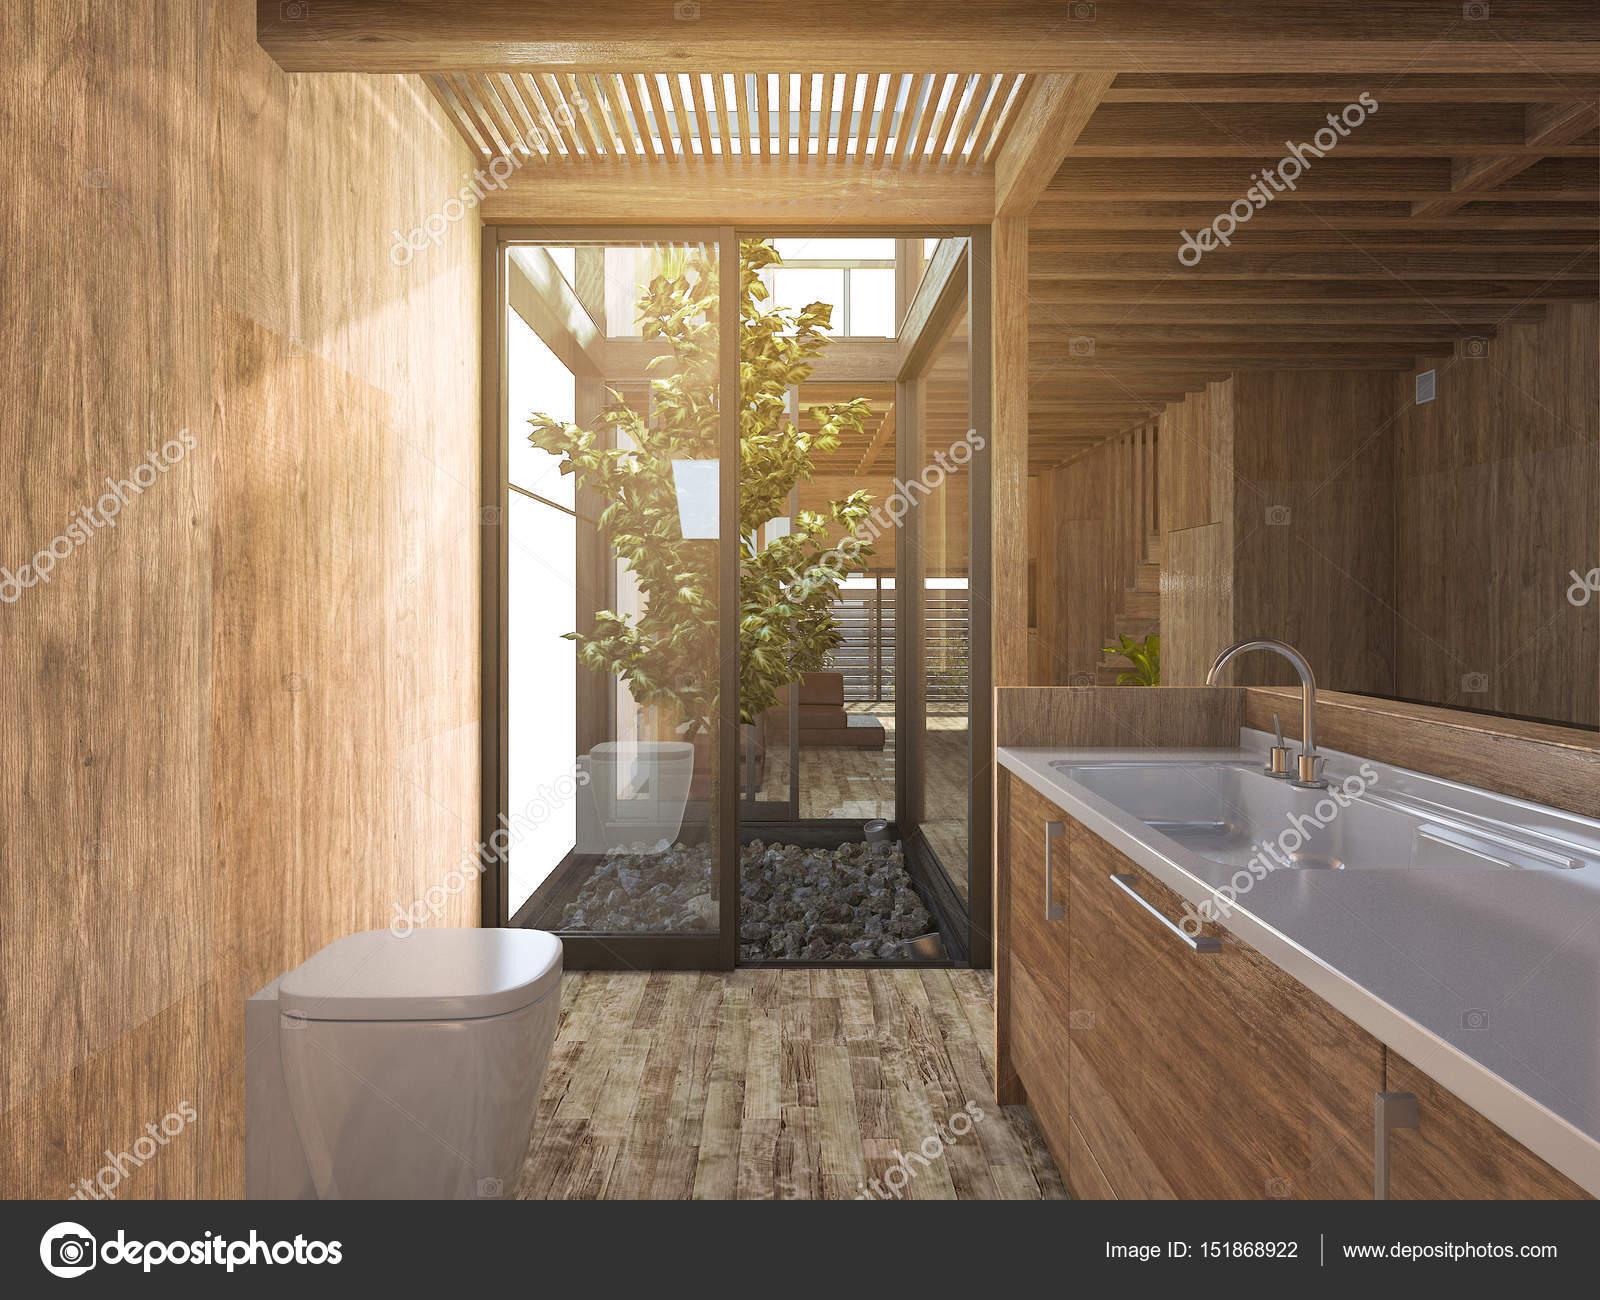 Zo gebruik je hout in de badkamer luxaflex